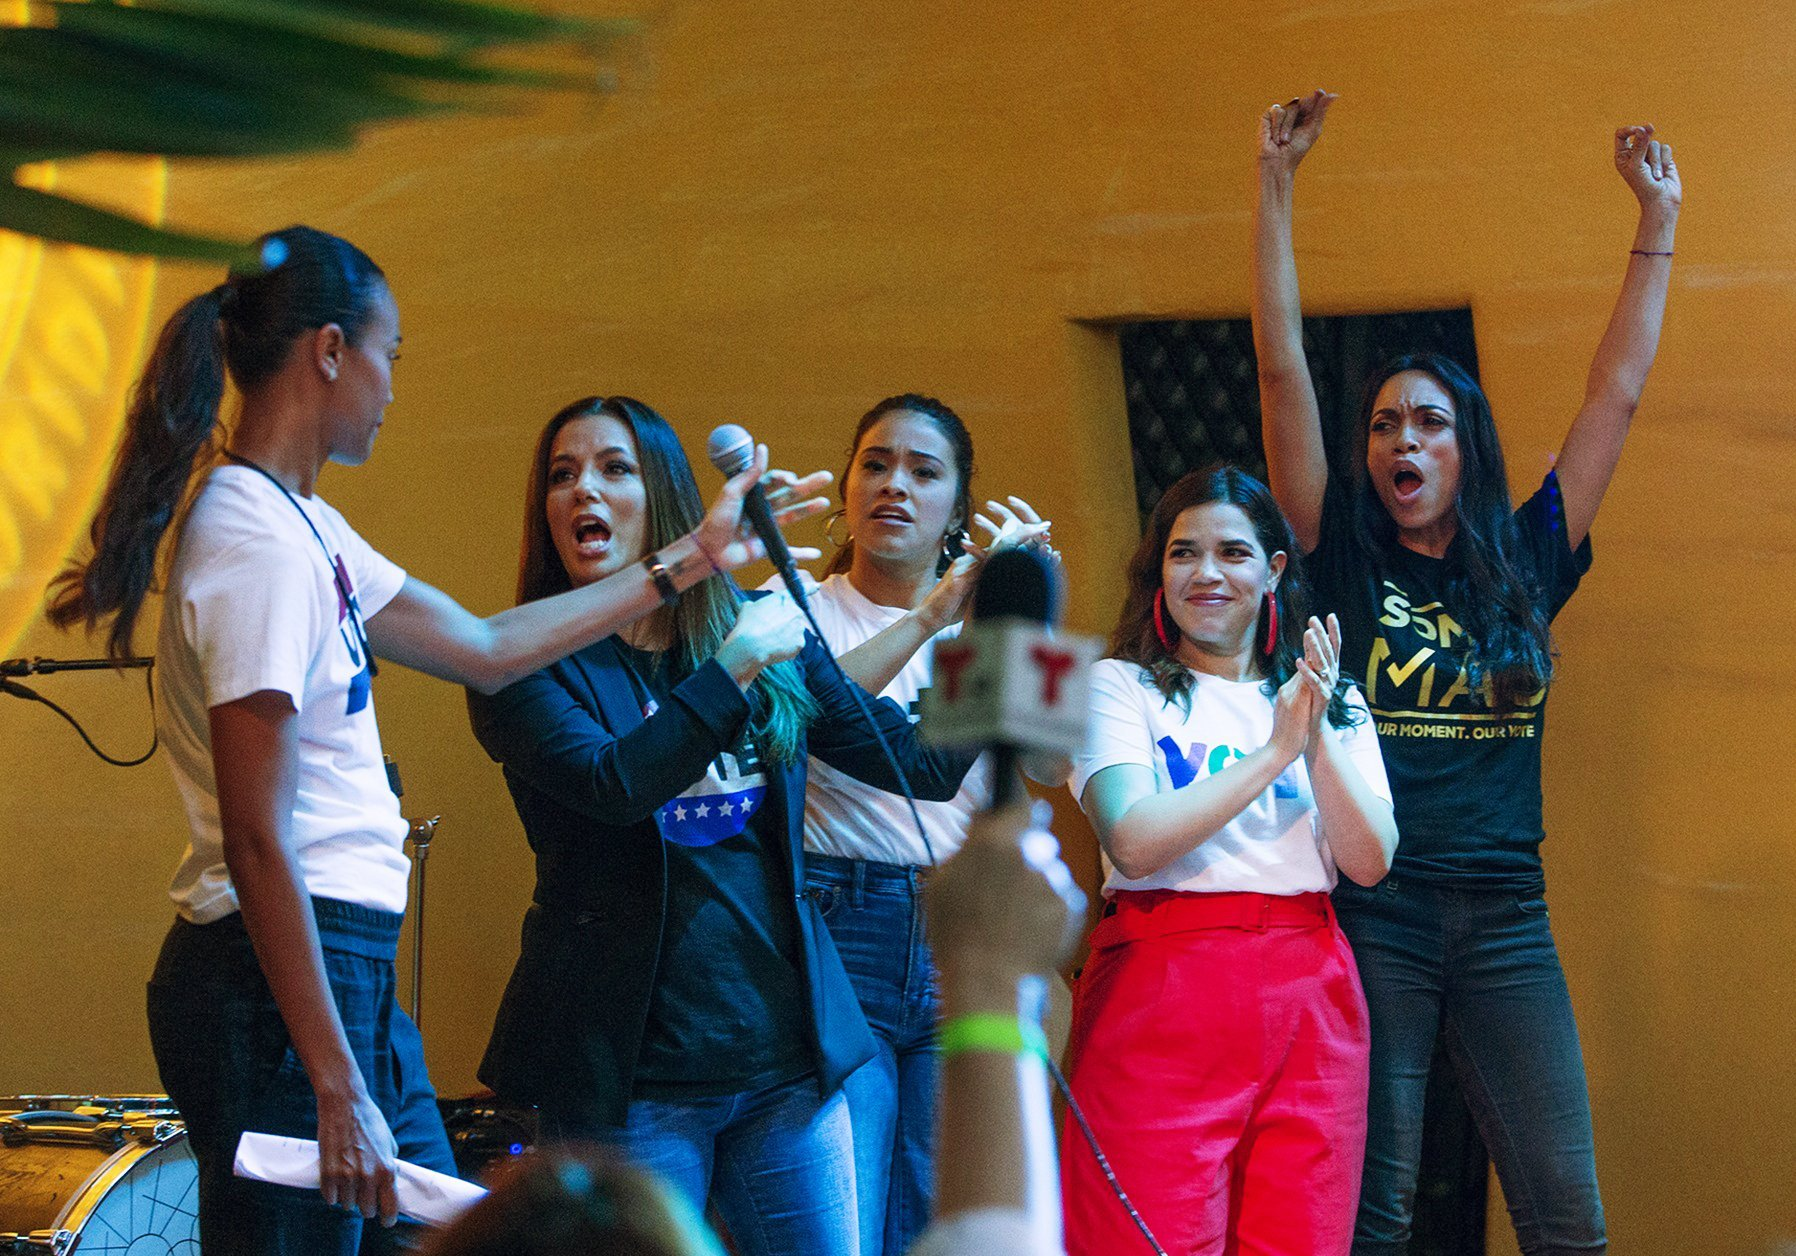 Longoria, Ferrera, Saldana and more rally for Latino votes